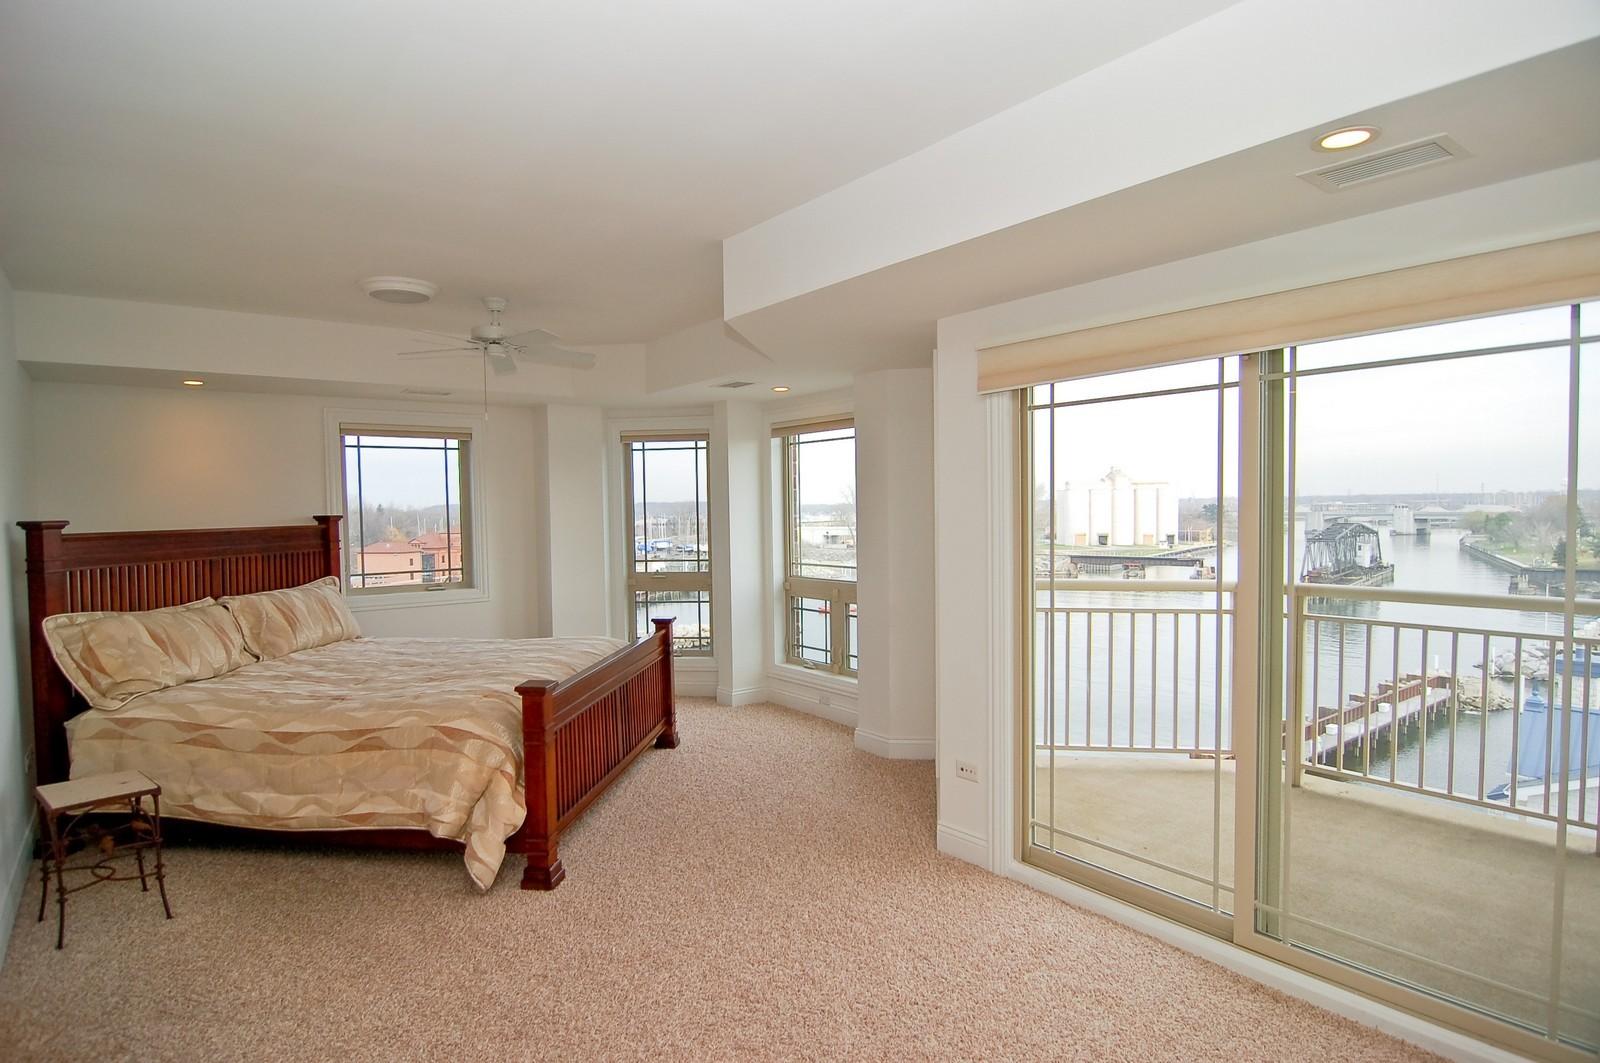 Real Estate Photography - 200- 7B Lake Street, St Joseph, MI, 49085 - Master Bedroom